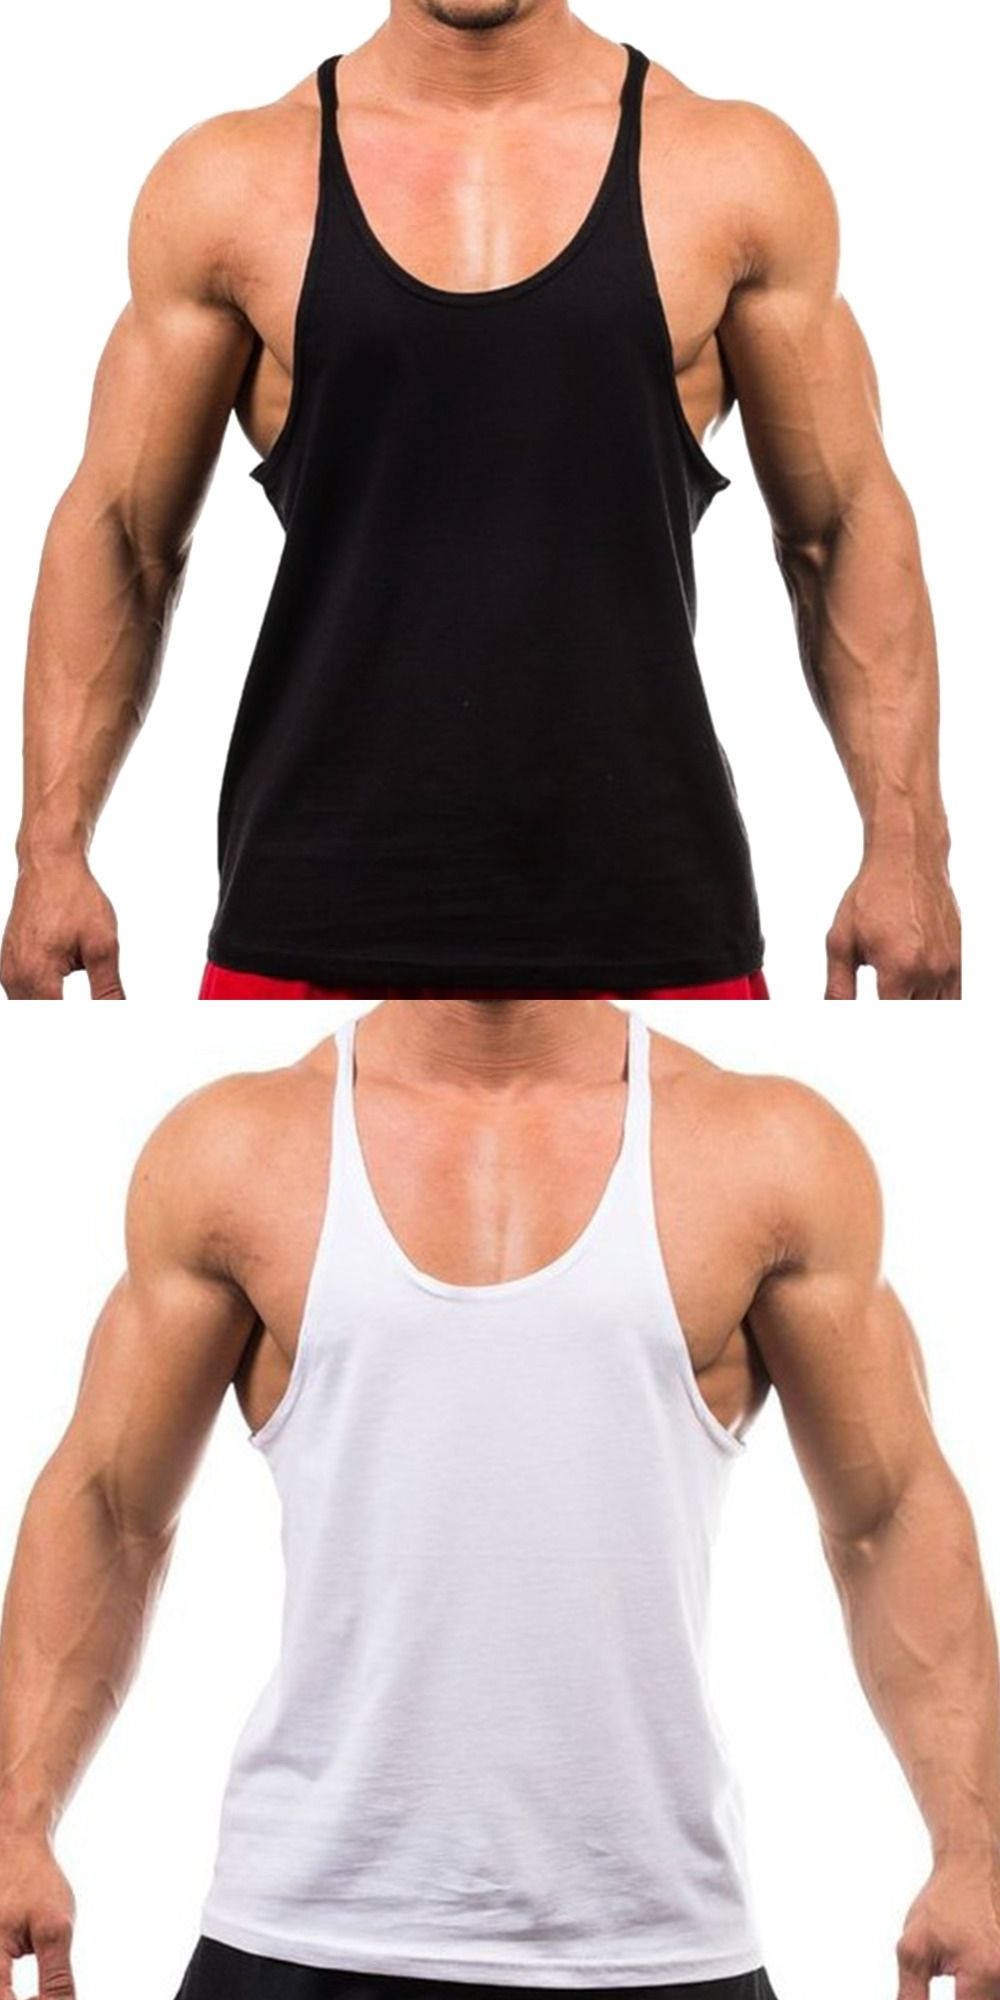 9194e60d1e302 2017 New Men Tank Top Cotton Sleeveless Bodybuilding Tank Tops Fitness Top  Black White Solid Color Men Shirt M-XXL Cheap